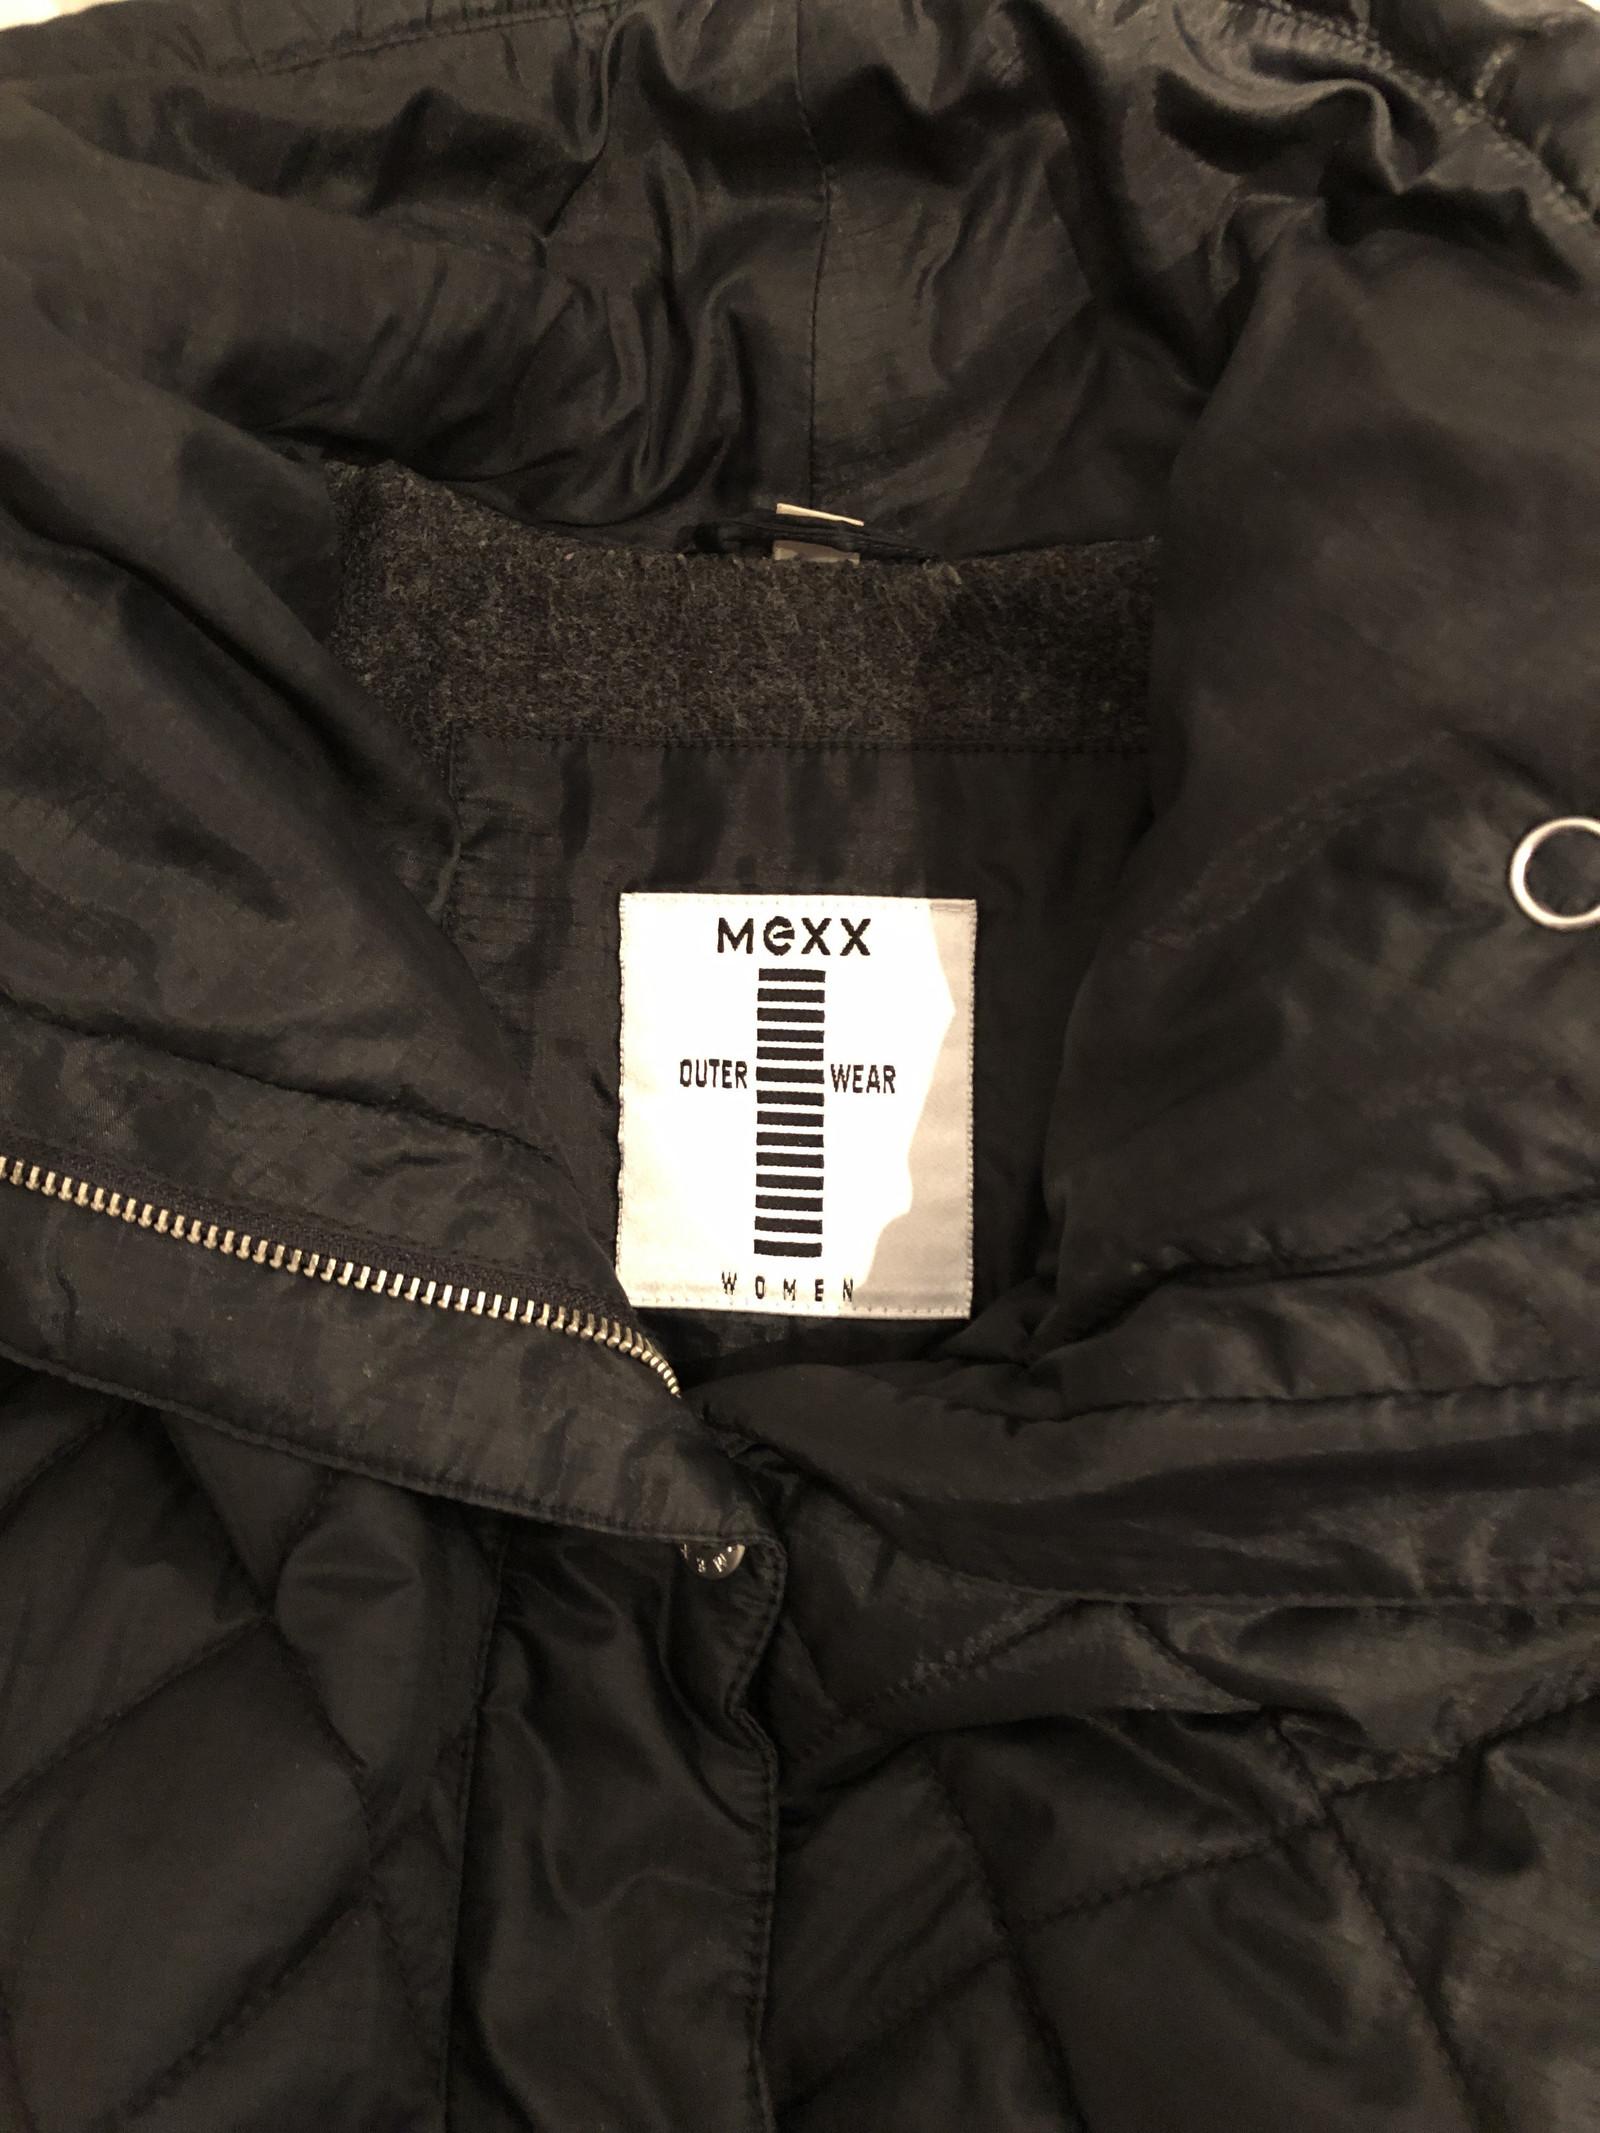 Mexx dame jakke selges | FINN.no